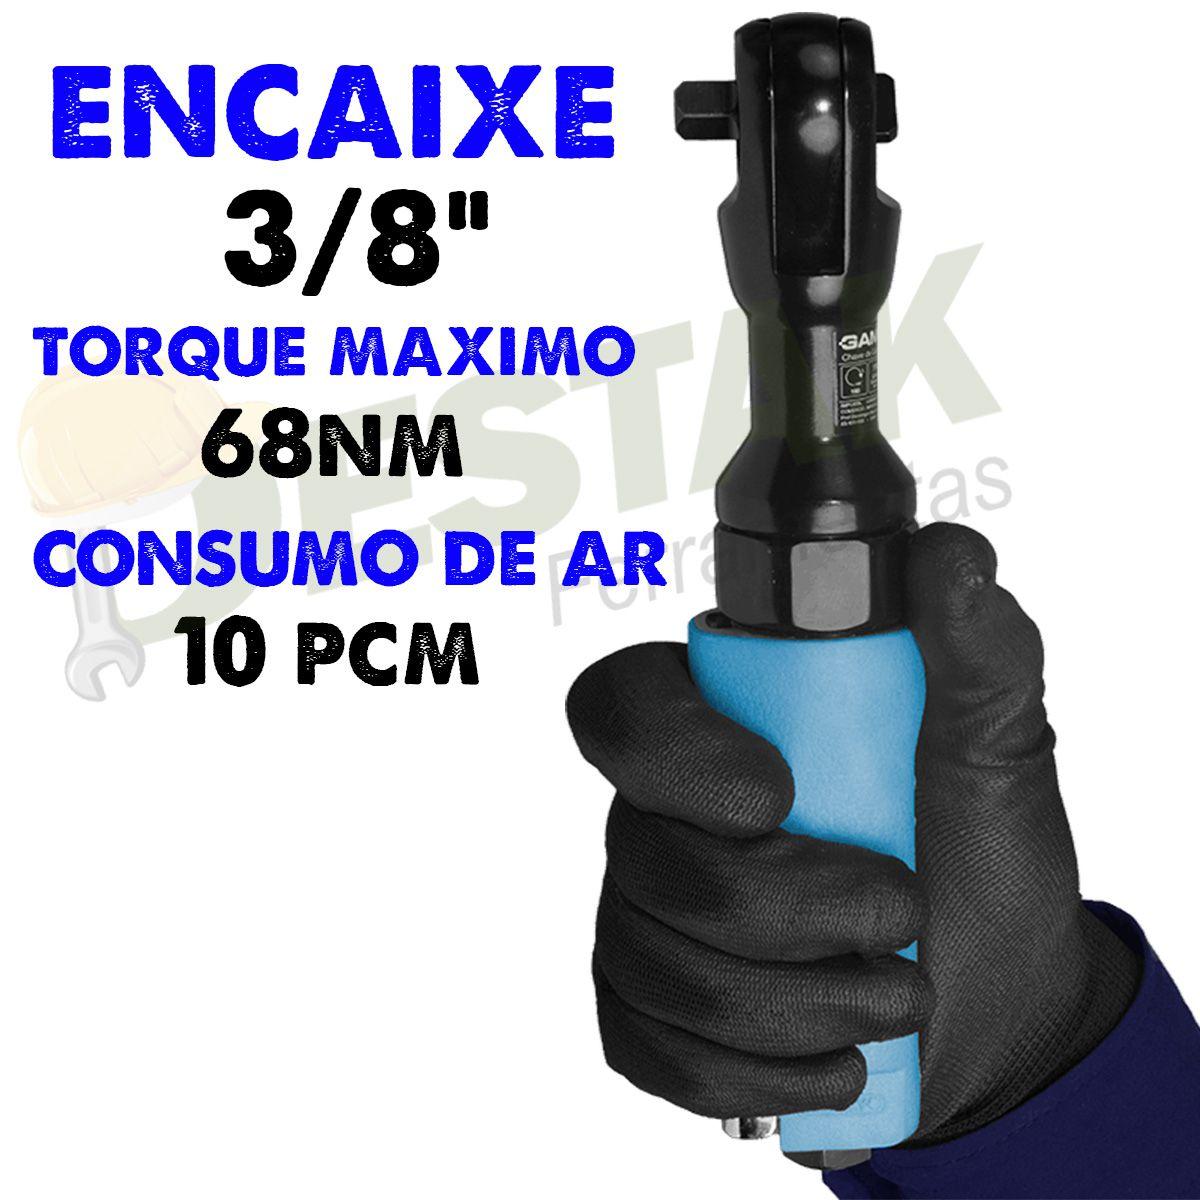 Chave Catraca Pneumática 3/8 G1383/br Gamma